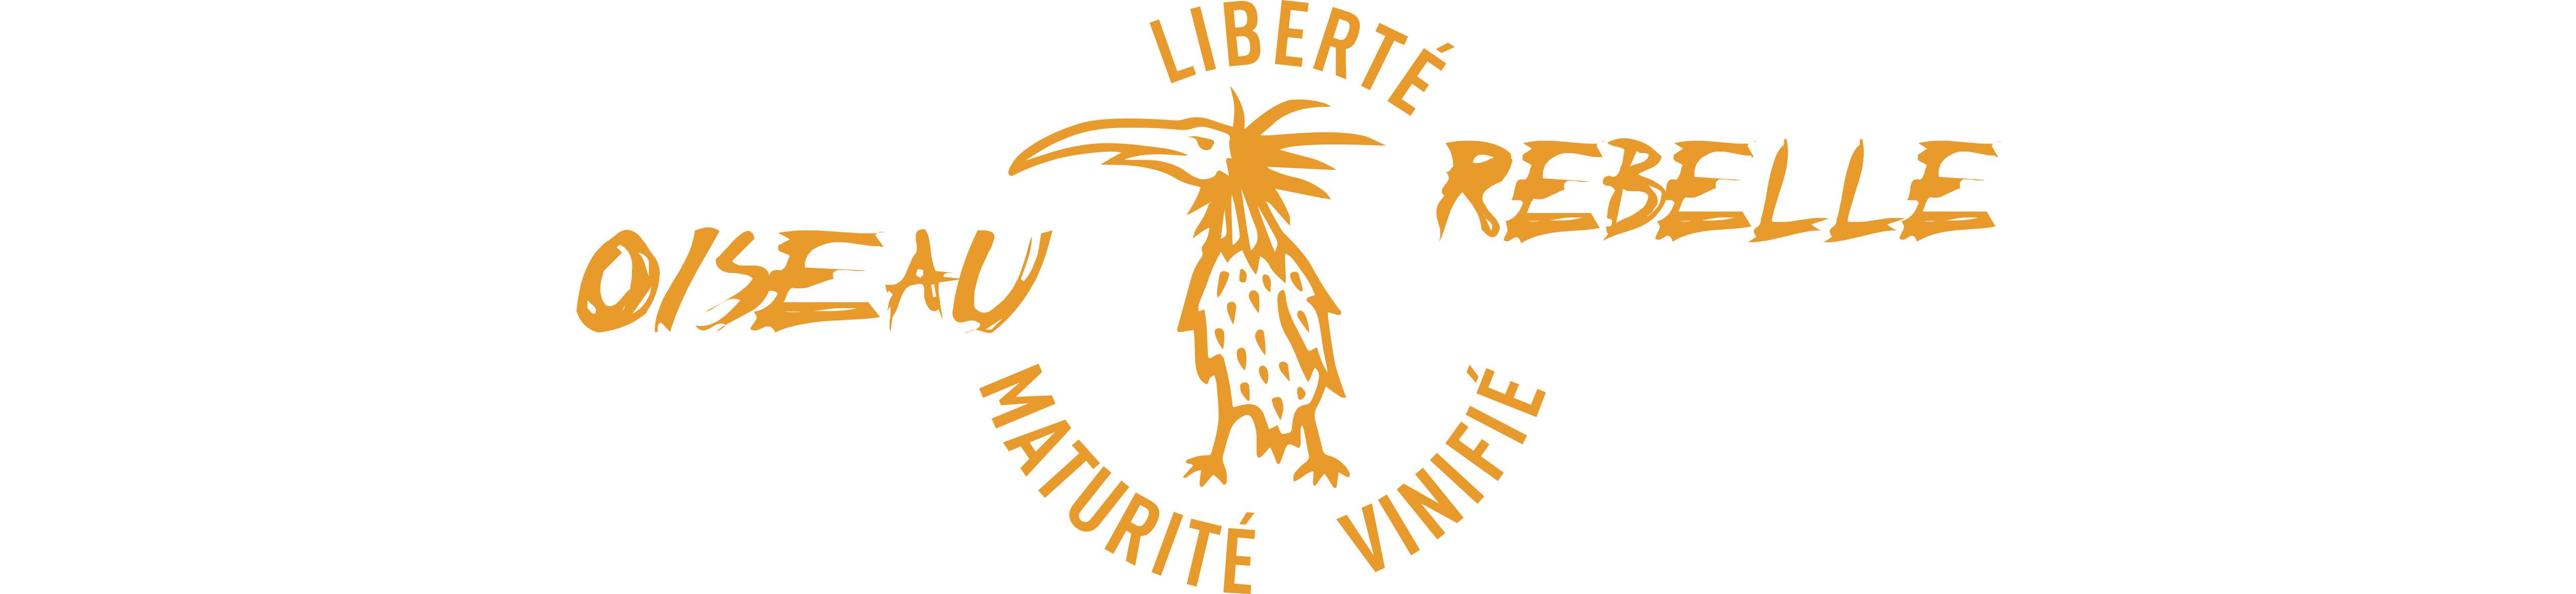 Oiseau-Rebelle